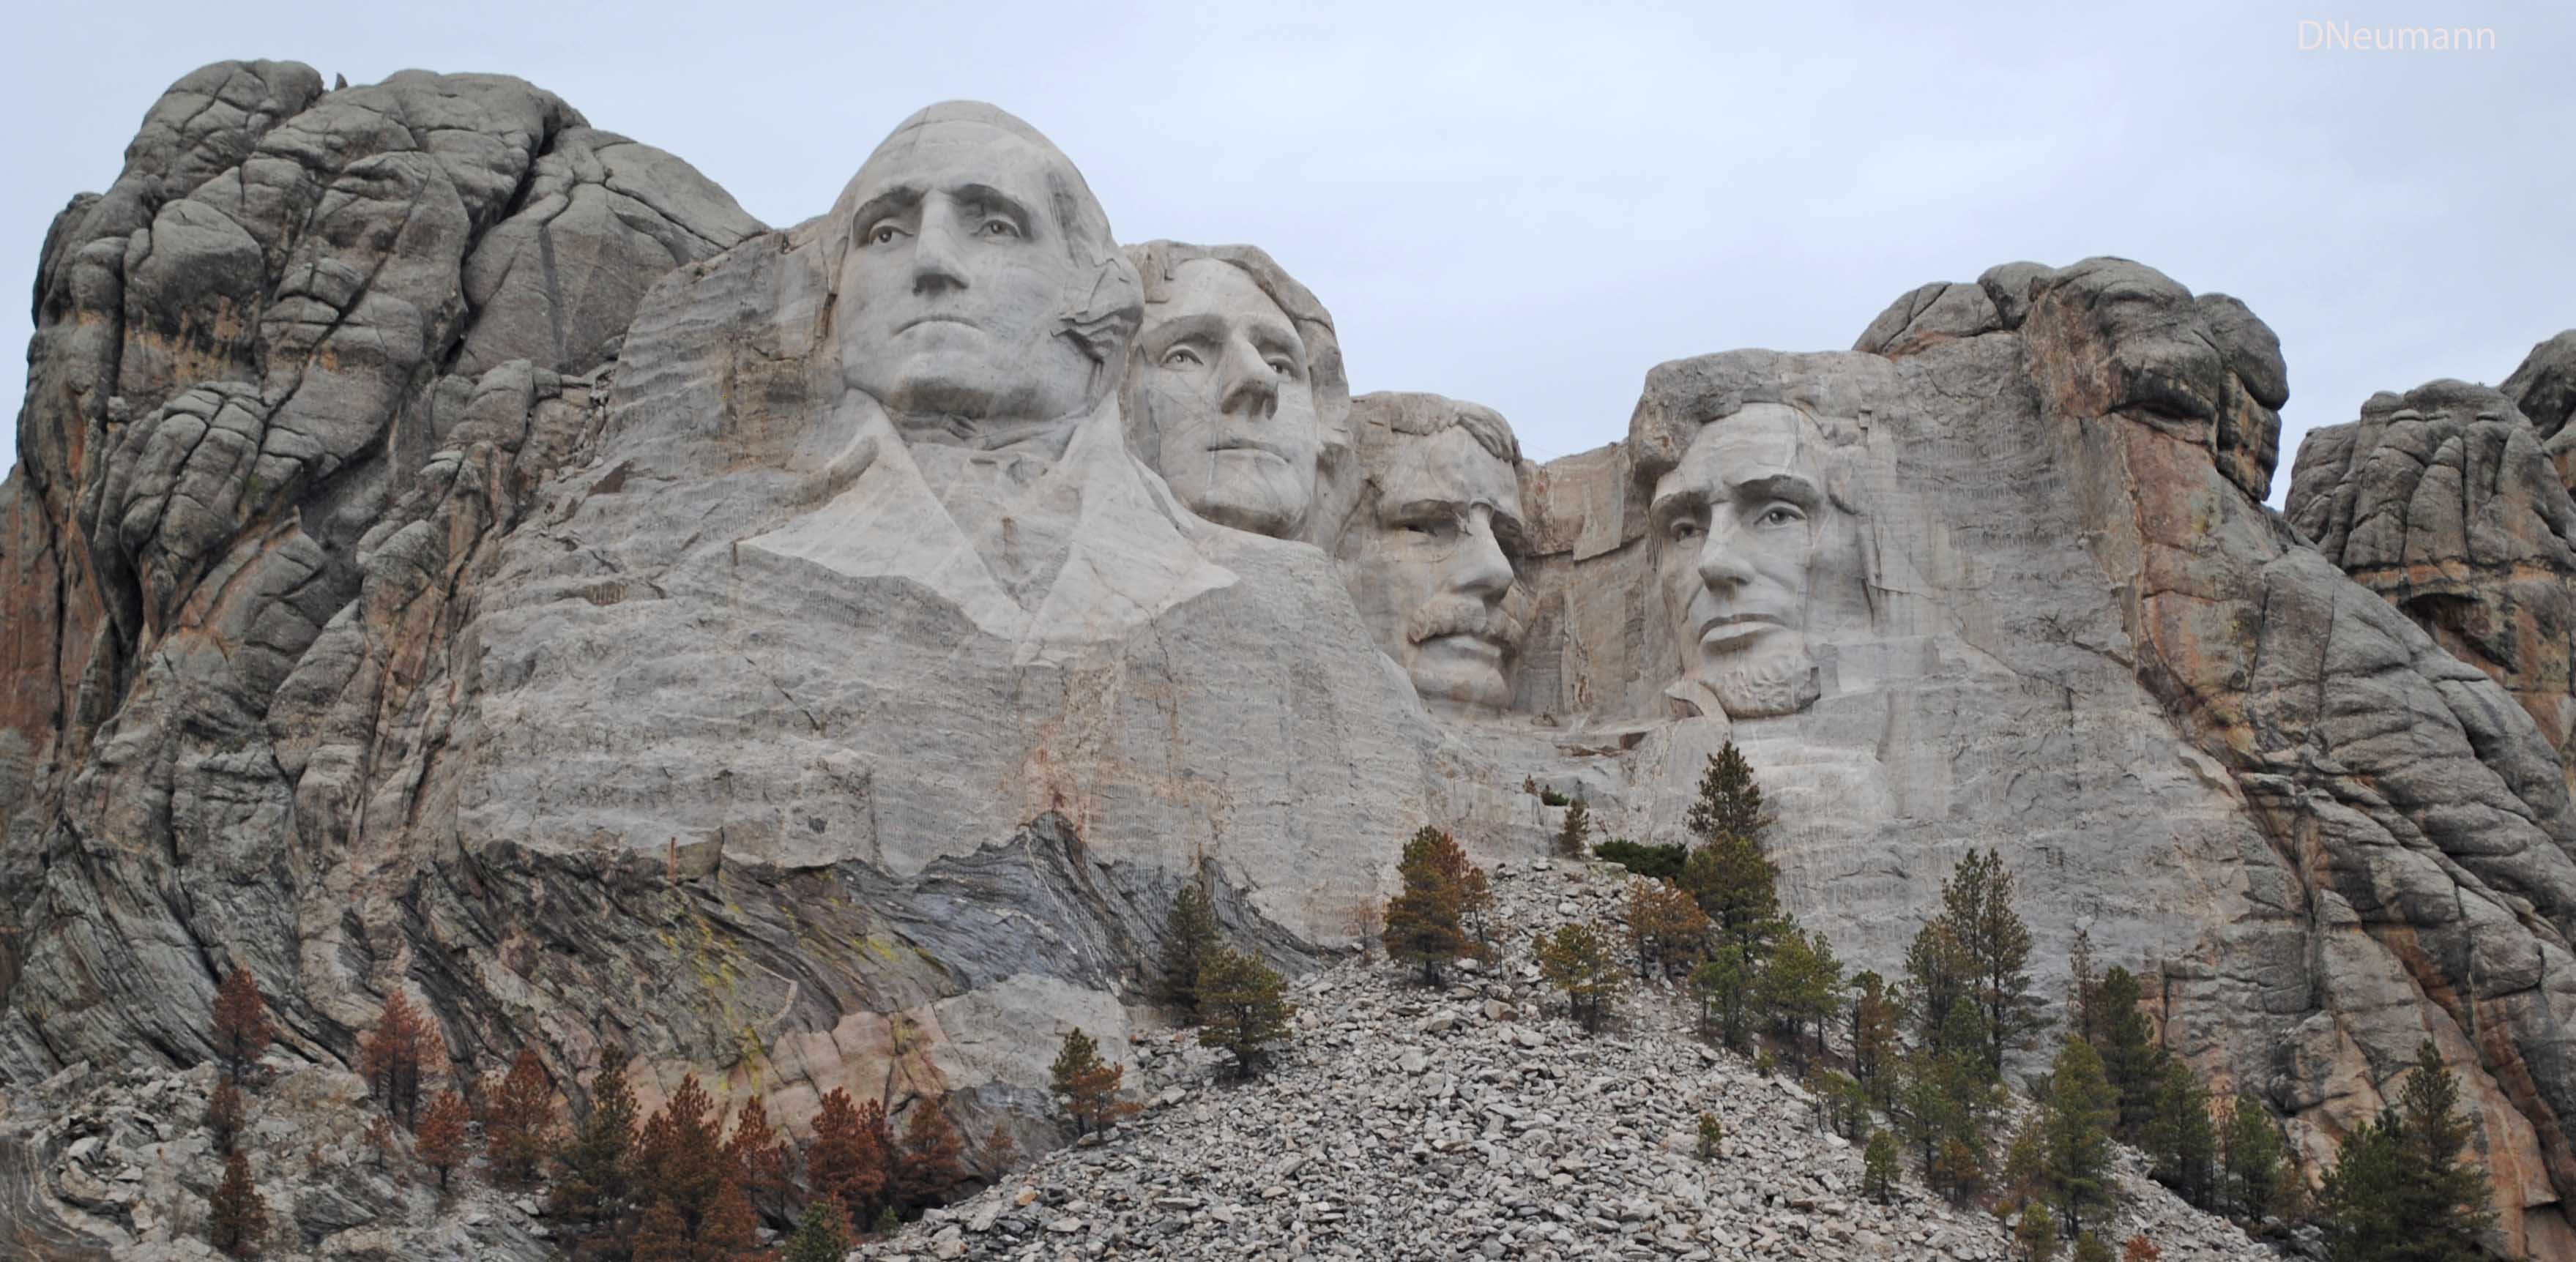 Mount rushmore national monument south dakota